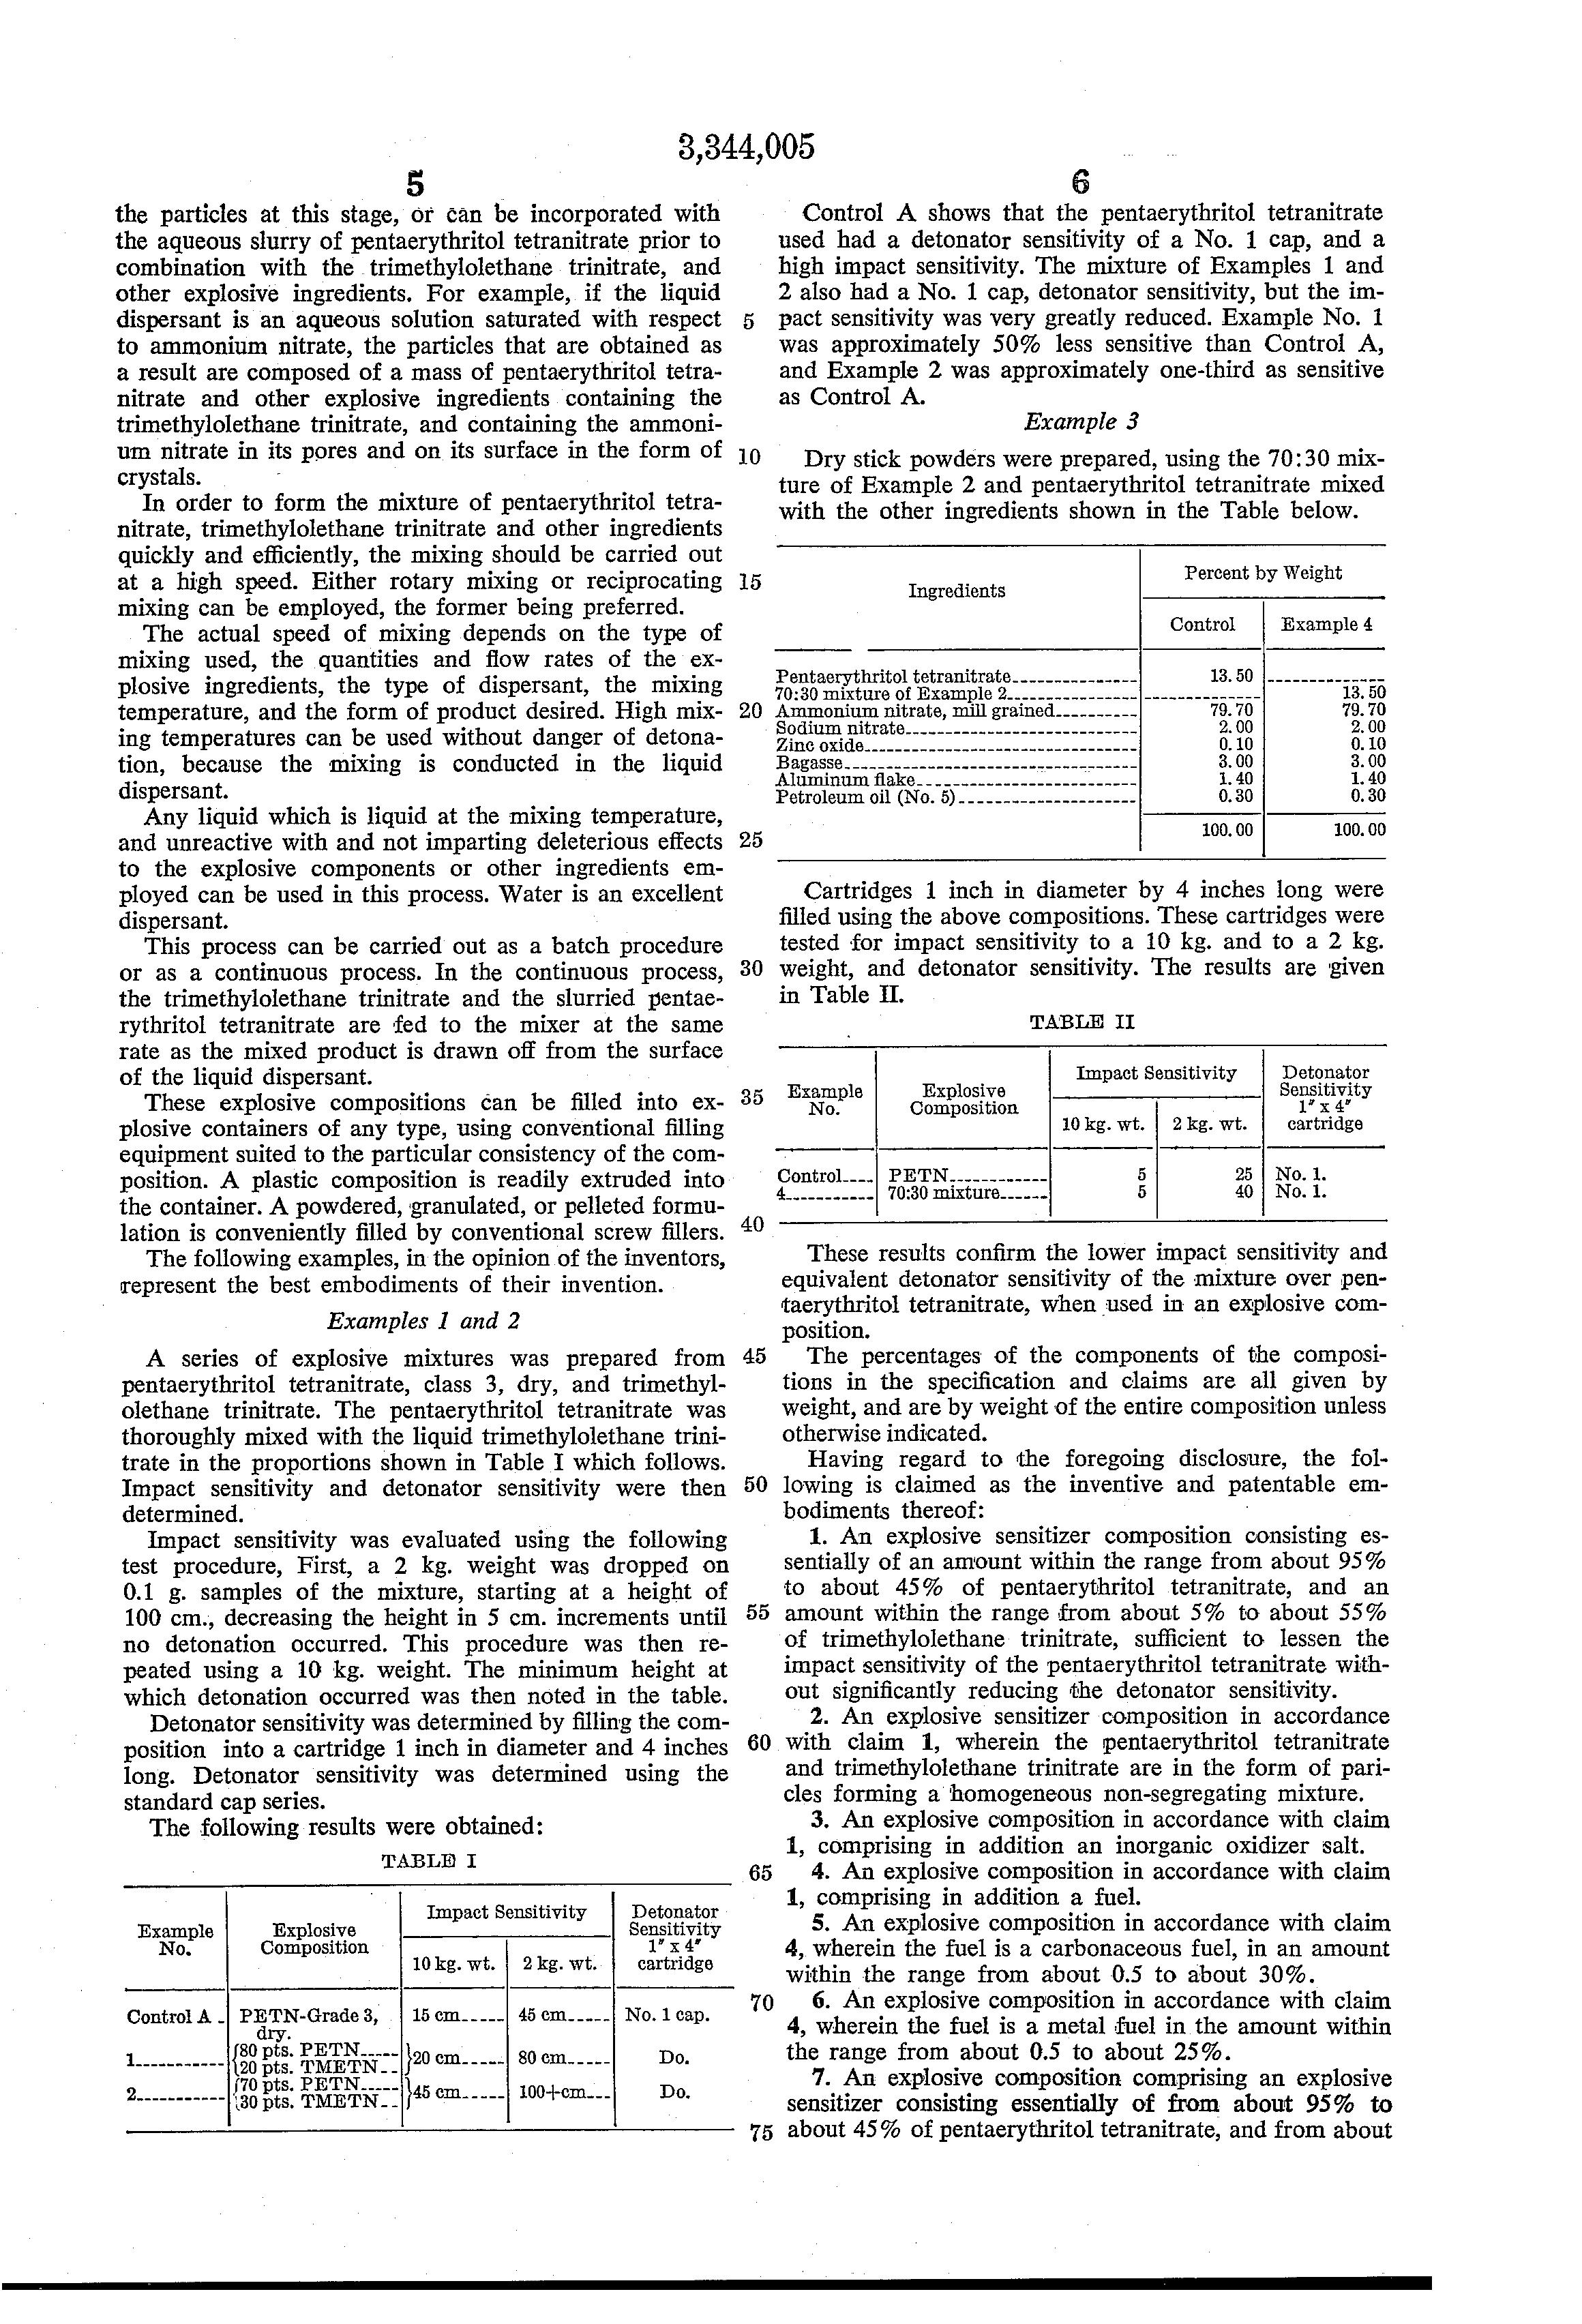 Patent US3344005 - Pentaerythritol tetranitrate